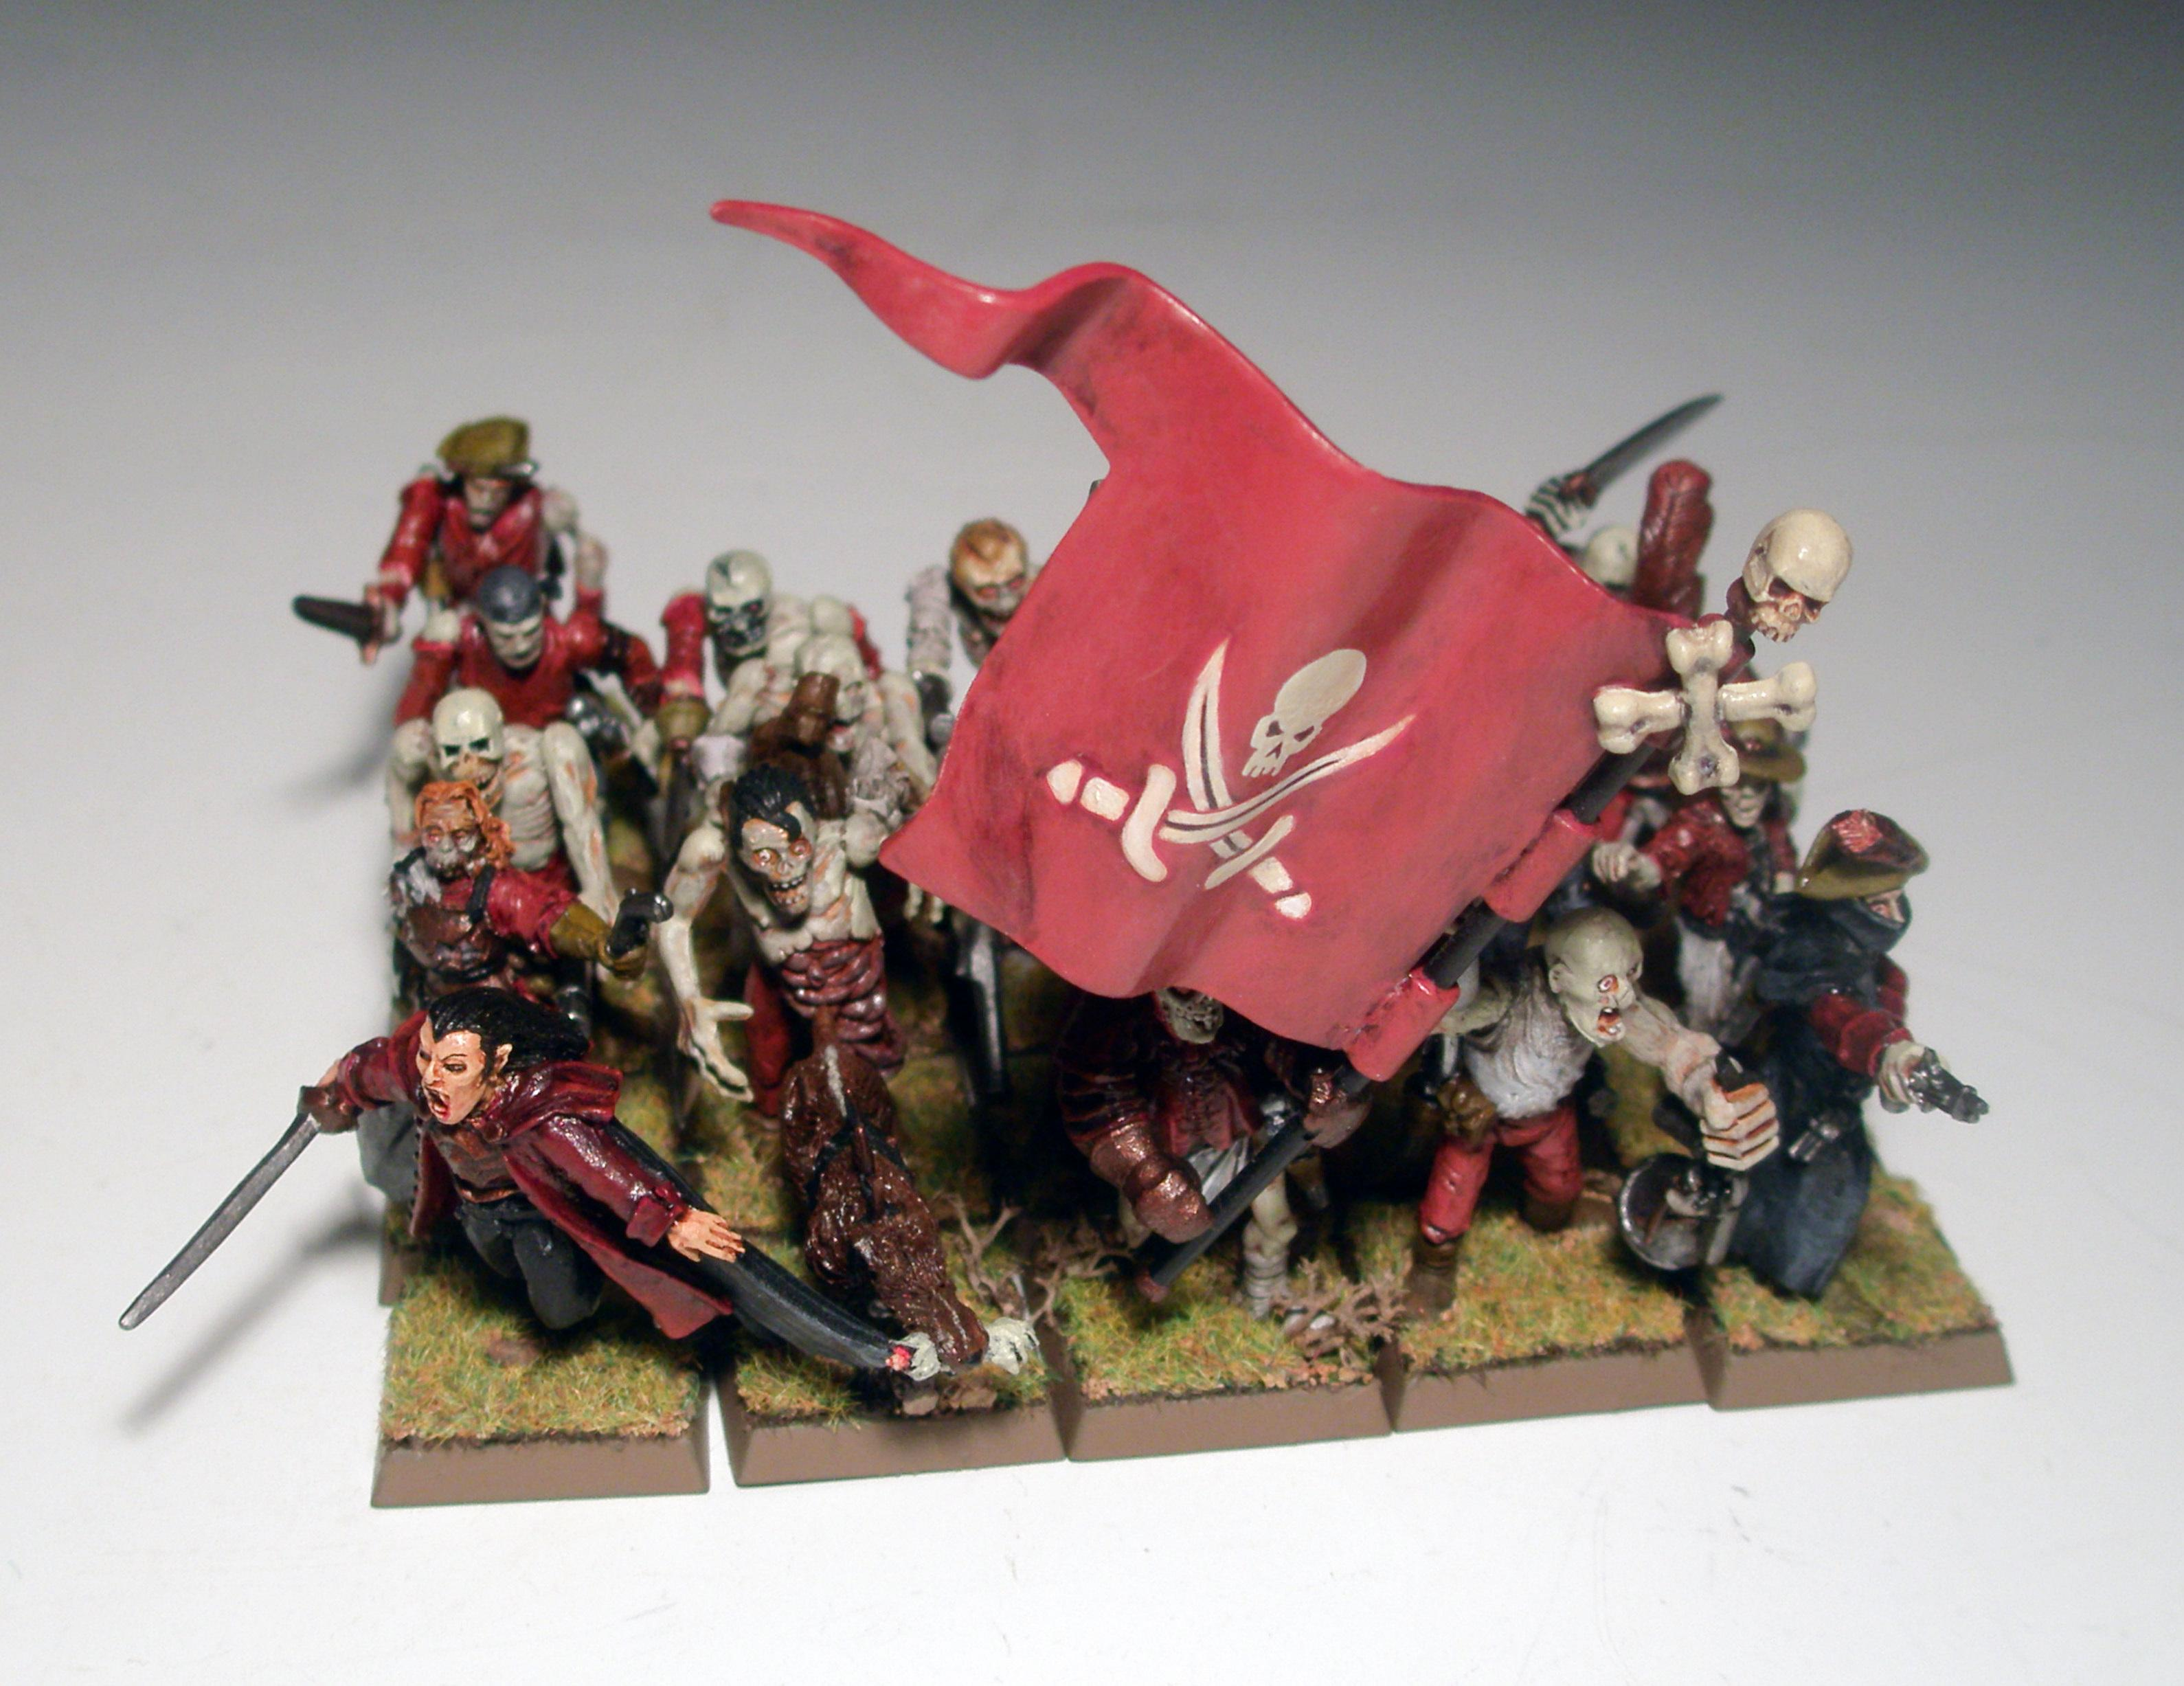 Luthor Harkon, Vampire Counts, Warhammer Fantasy, Zombie Pirate Gunnery Mob, Zombie Pirates